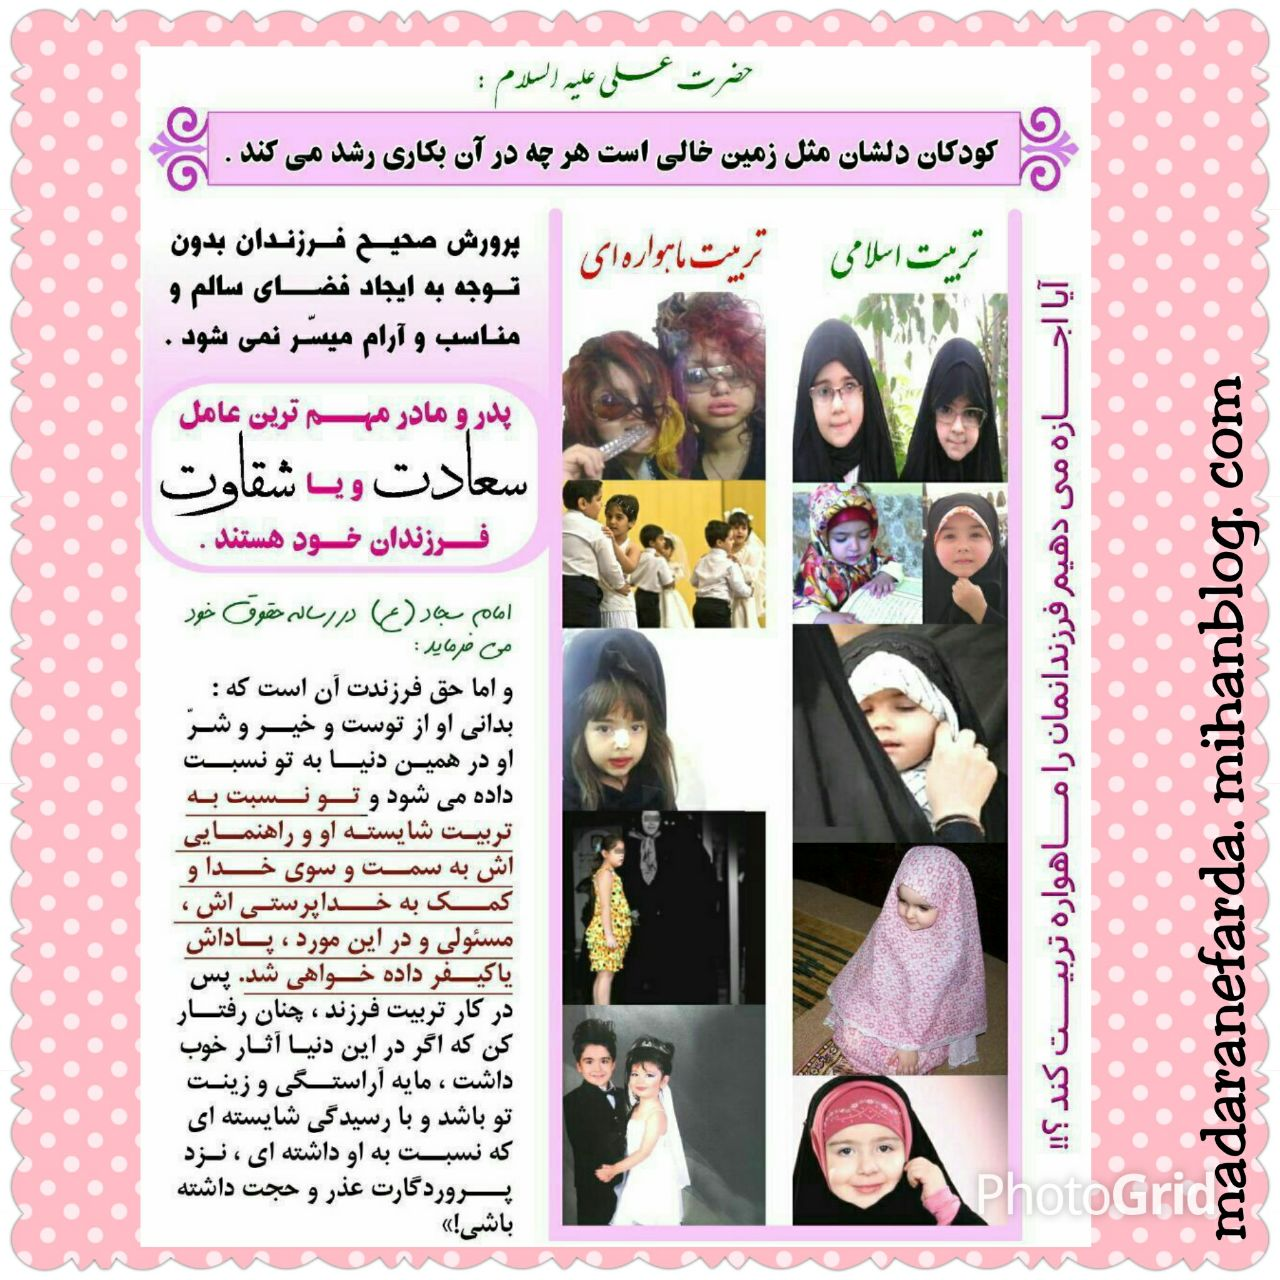 http://uupload.ir/files/l390_img_۲۰۱۵۰۵۱۴_۲۲۴۵۲۴.jpg